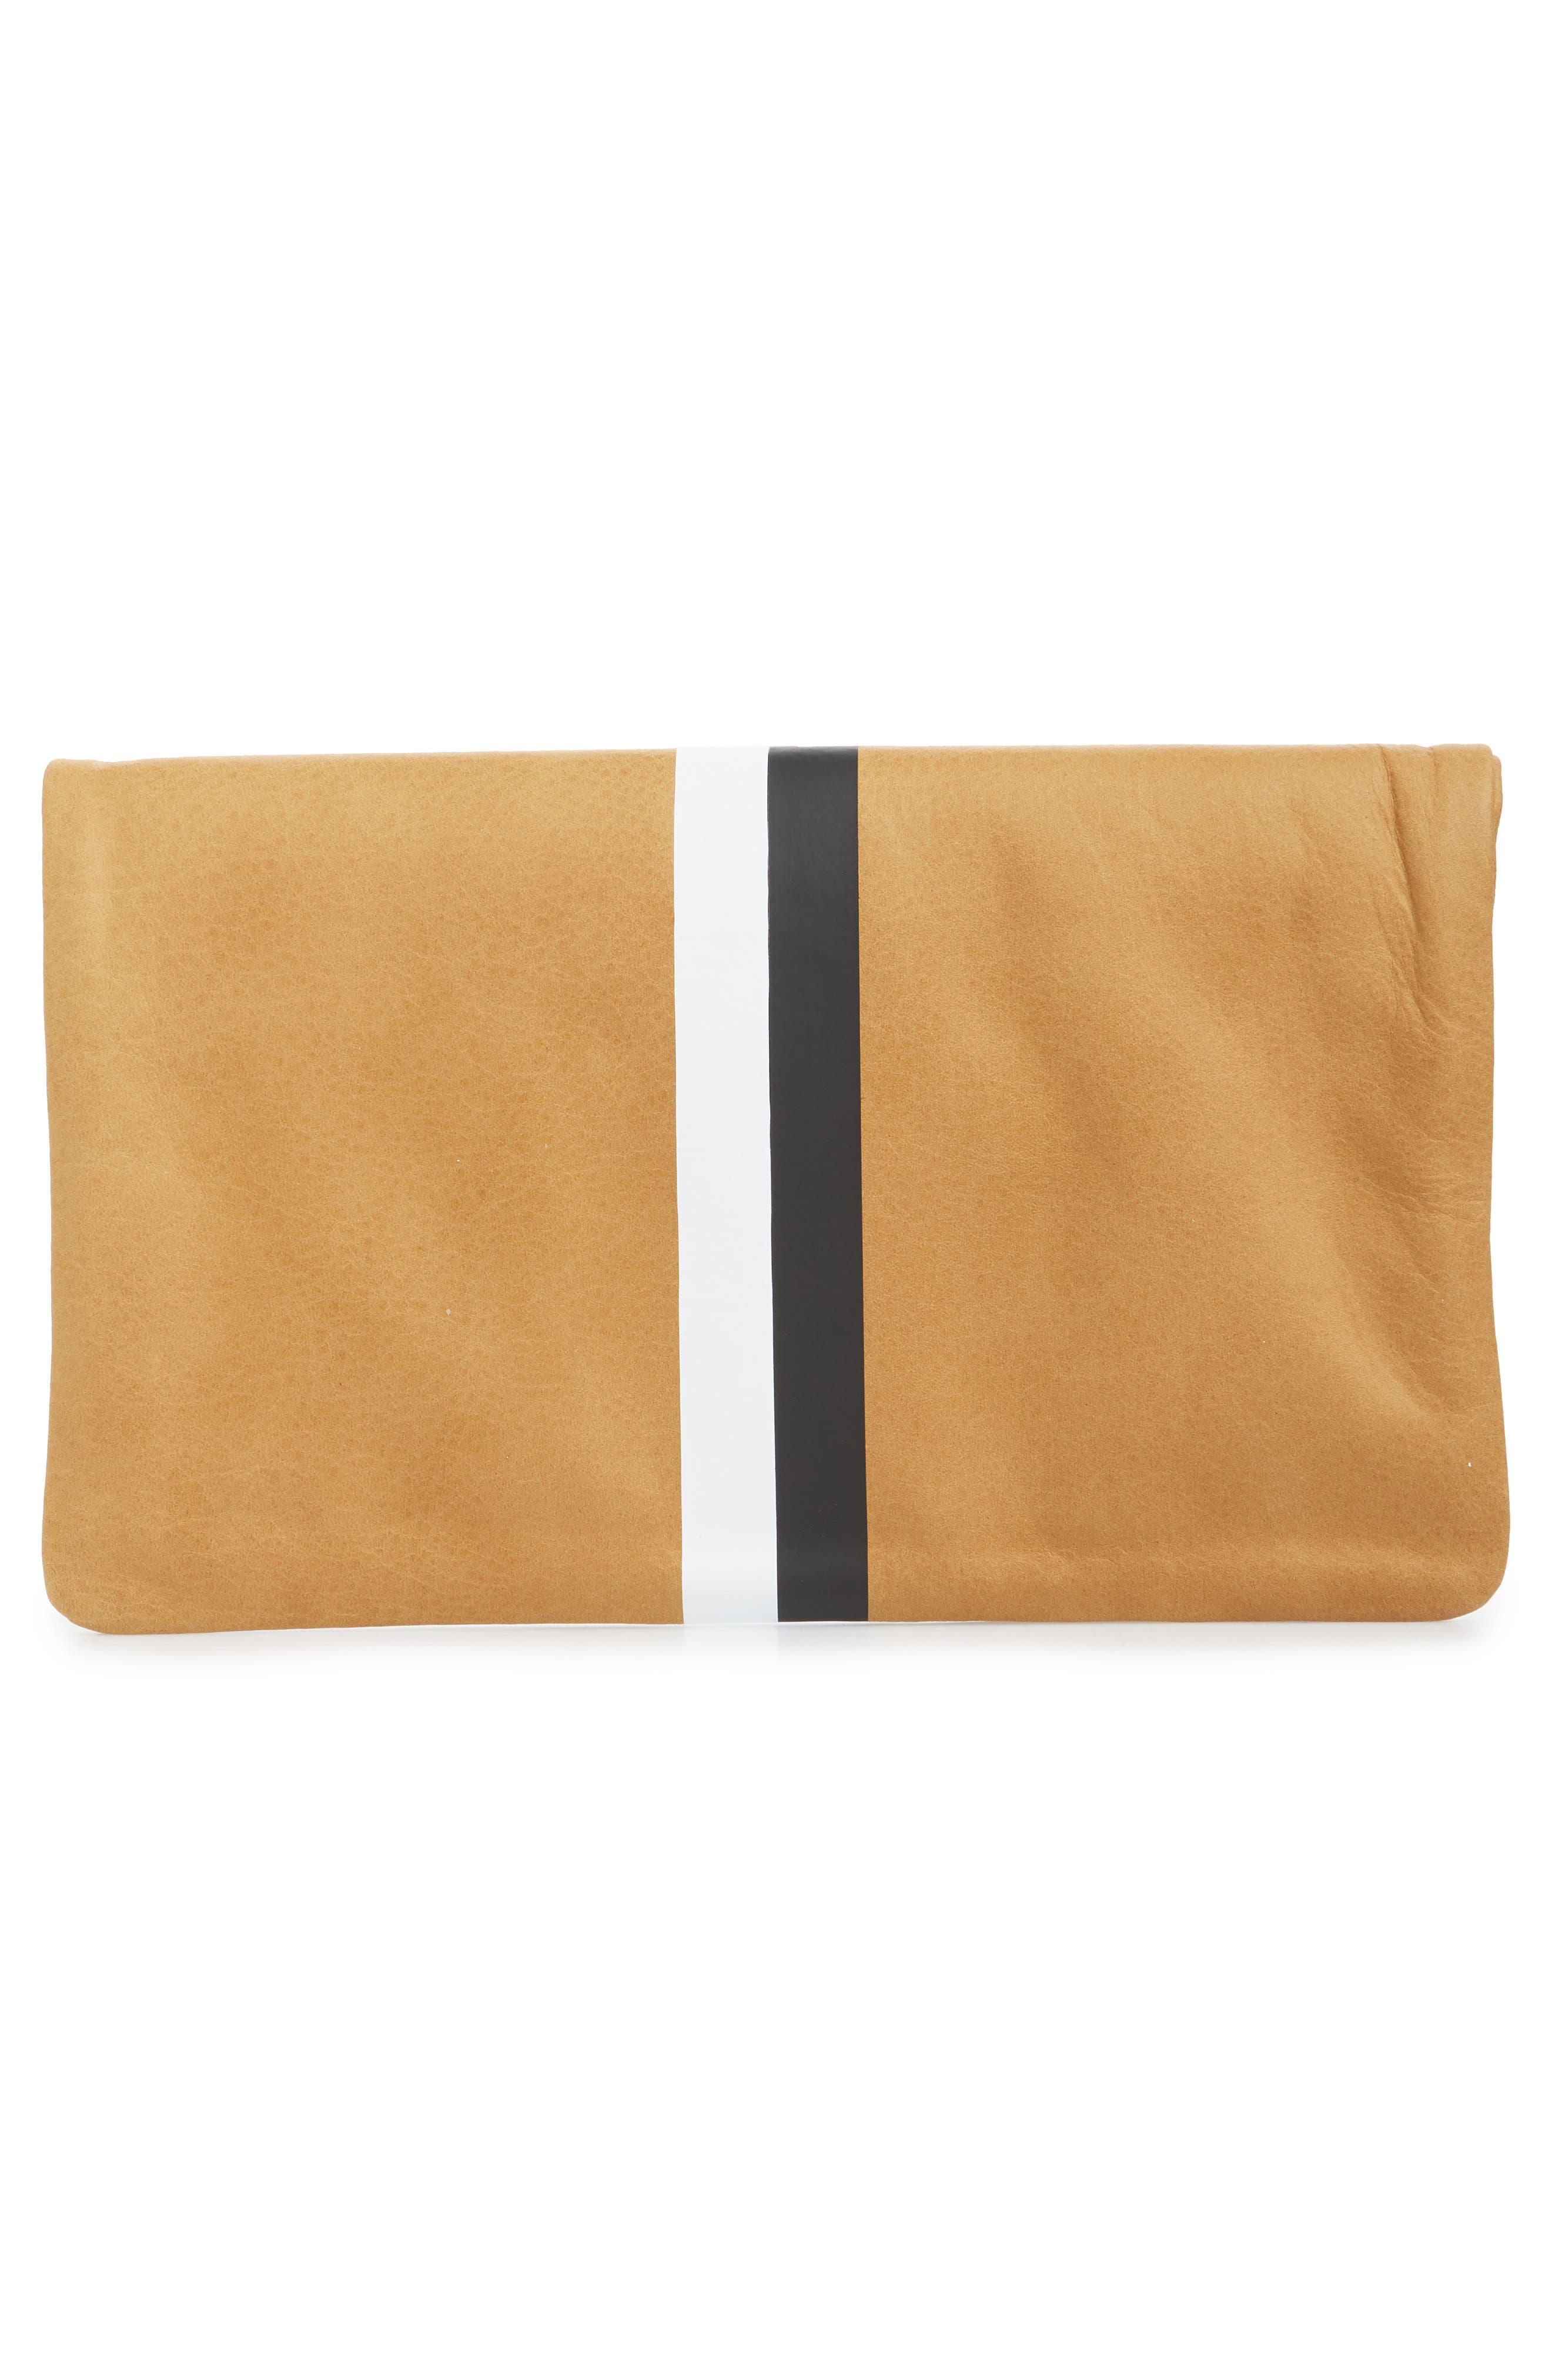 Center Stripe Leather Foldover Clutch,                             Alternate thumbnail 3, color,                             CAMEL